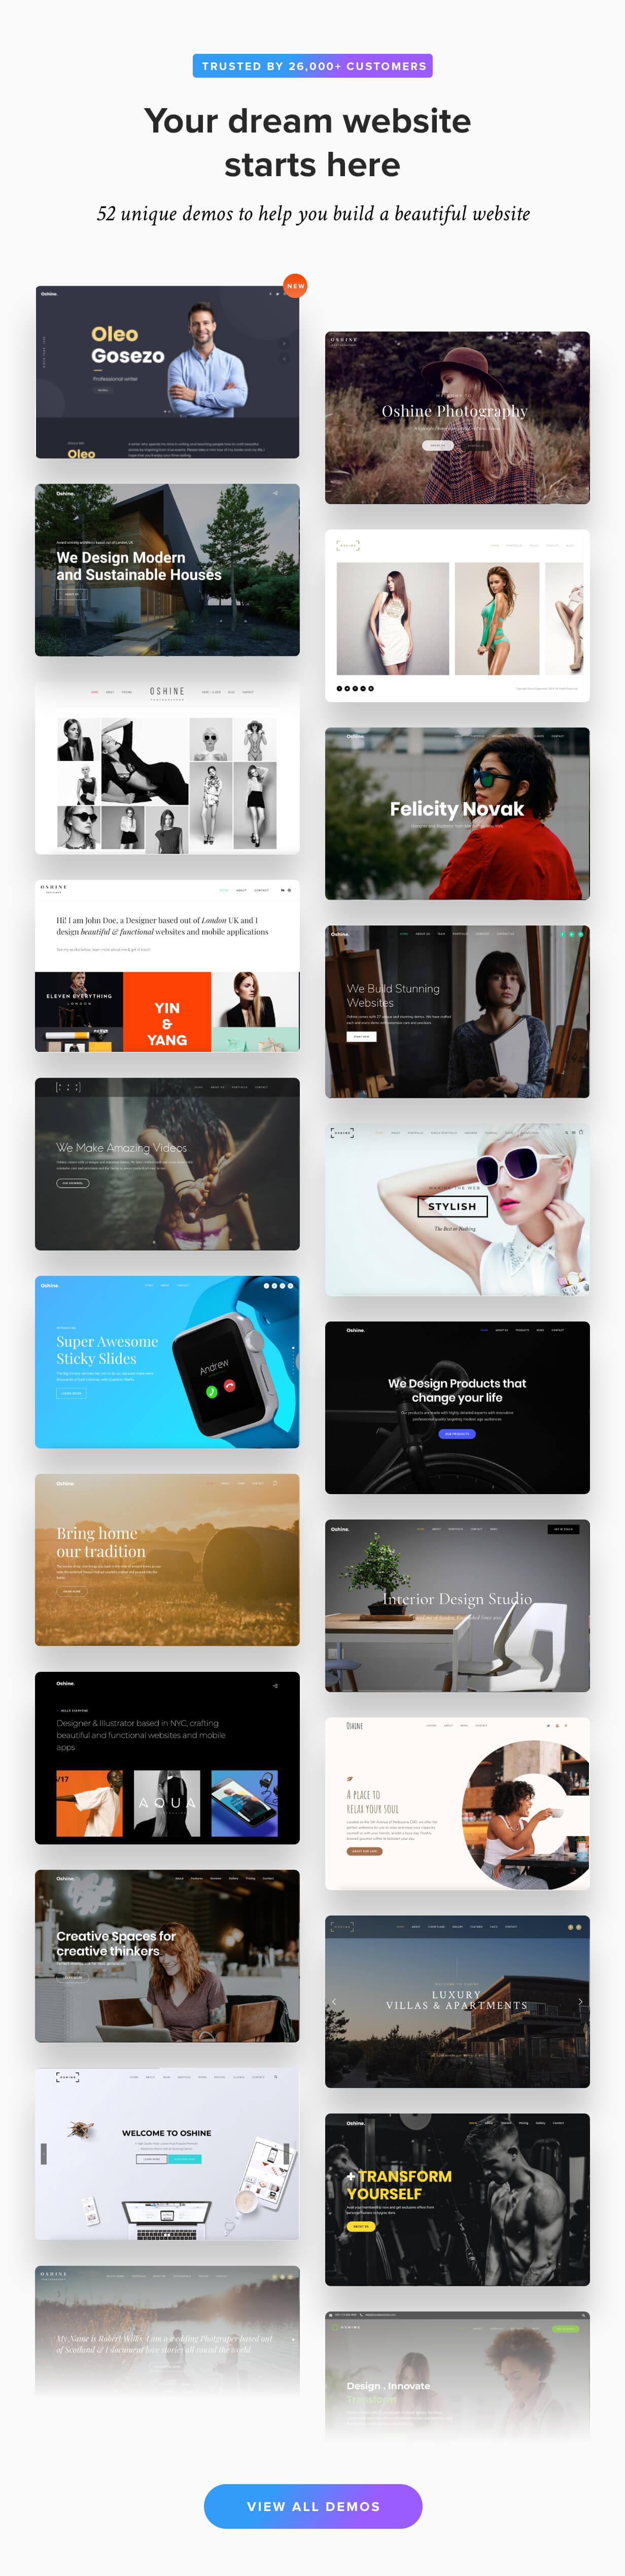 Oshine - Best Creative theme for WordPress